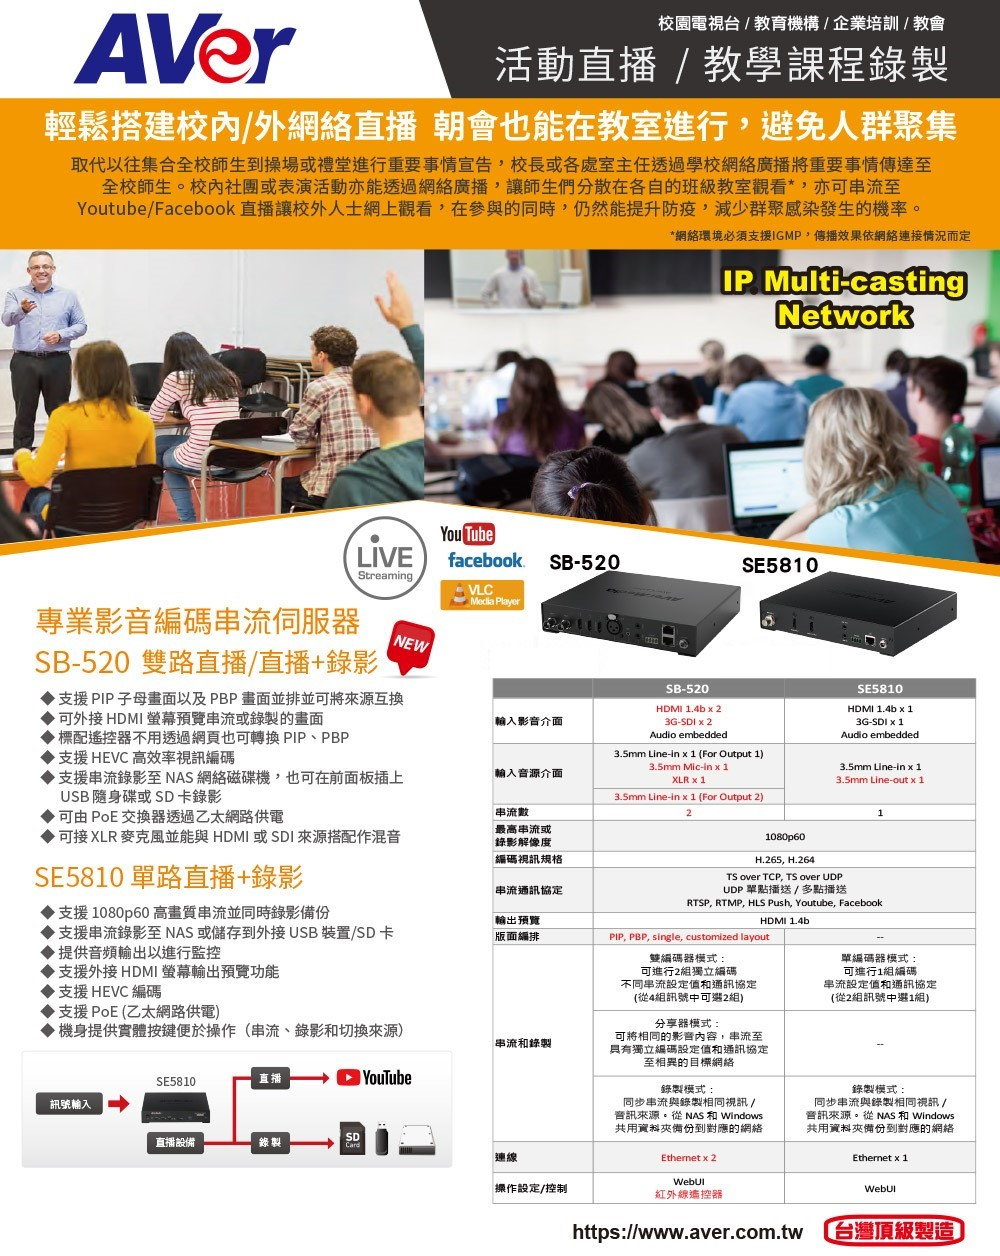 AVer最新「SB-520」專業直播錄,影音編碼及網絡串流伺服器●Dual HDMI/3G-SDI●H.265 1080p60●訊號/PIP版面切換●NAS/SD/USB錄影●輕鬆搭建內聯網廣播及網上直播~即時編碼、串流、儲存一機搞掂!